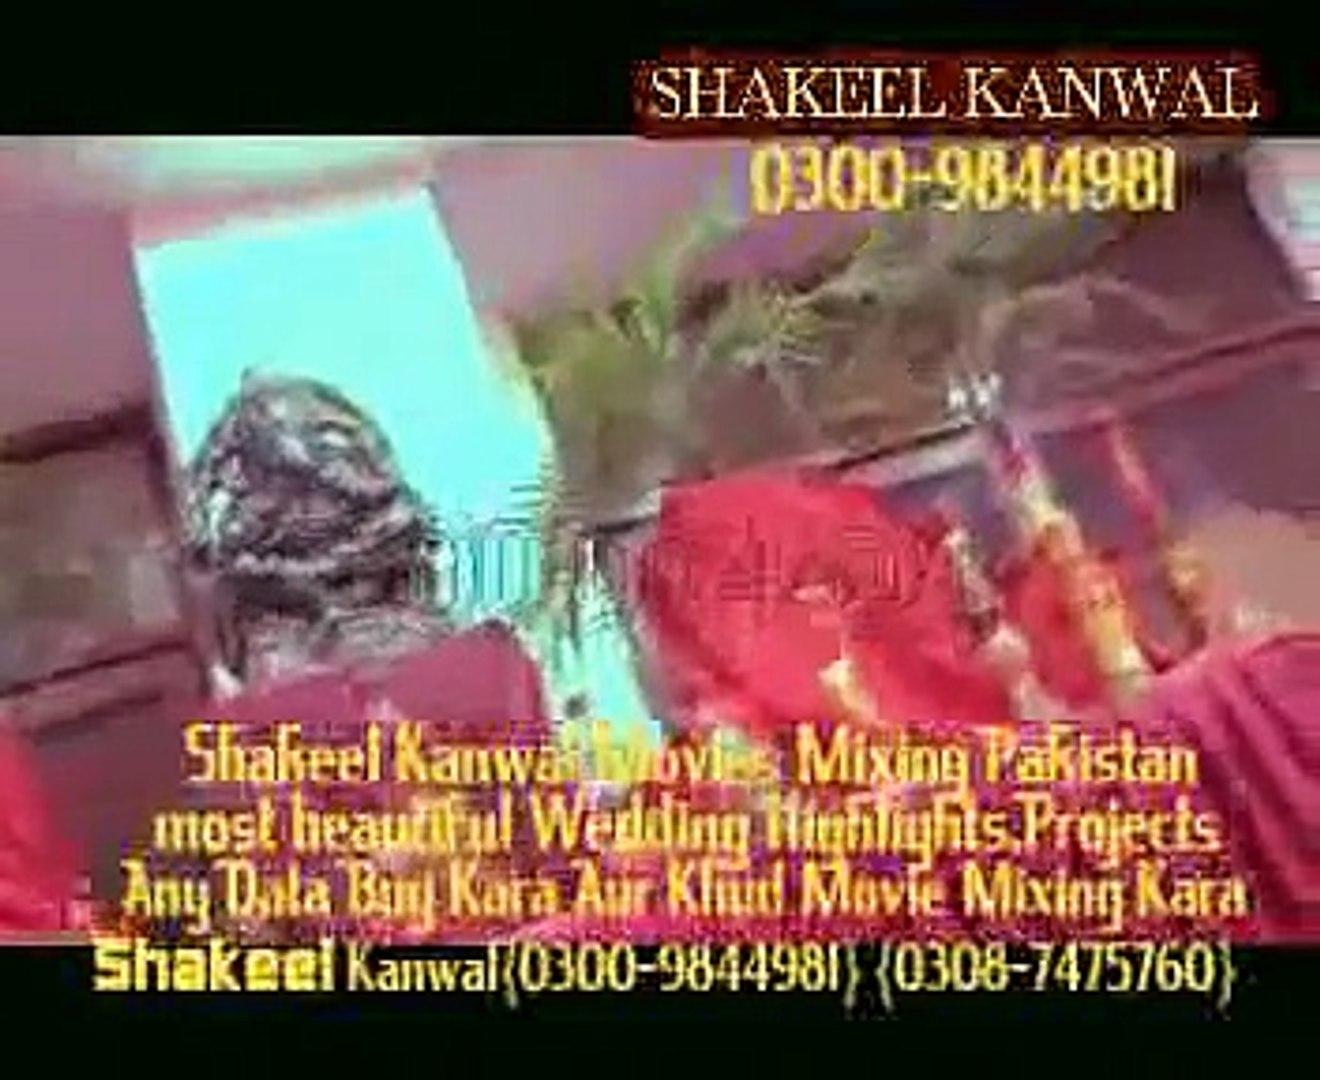 New Edius Star HD Titles indin bollywood wedding  pakistan Wedding Avid Liquid Gold New Projects Ado